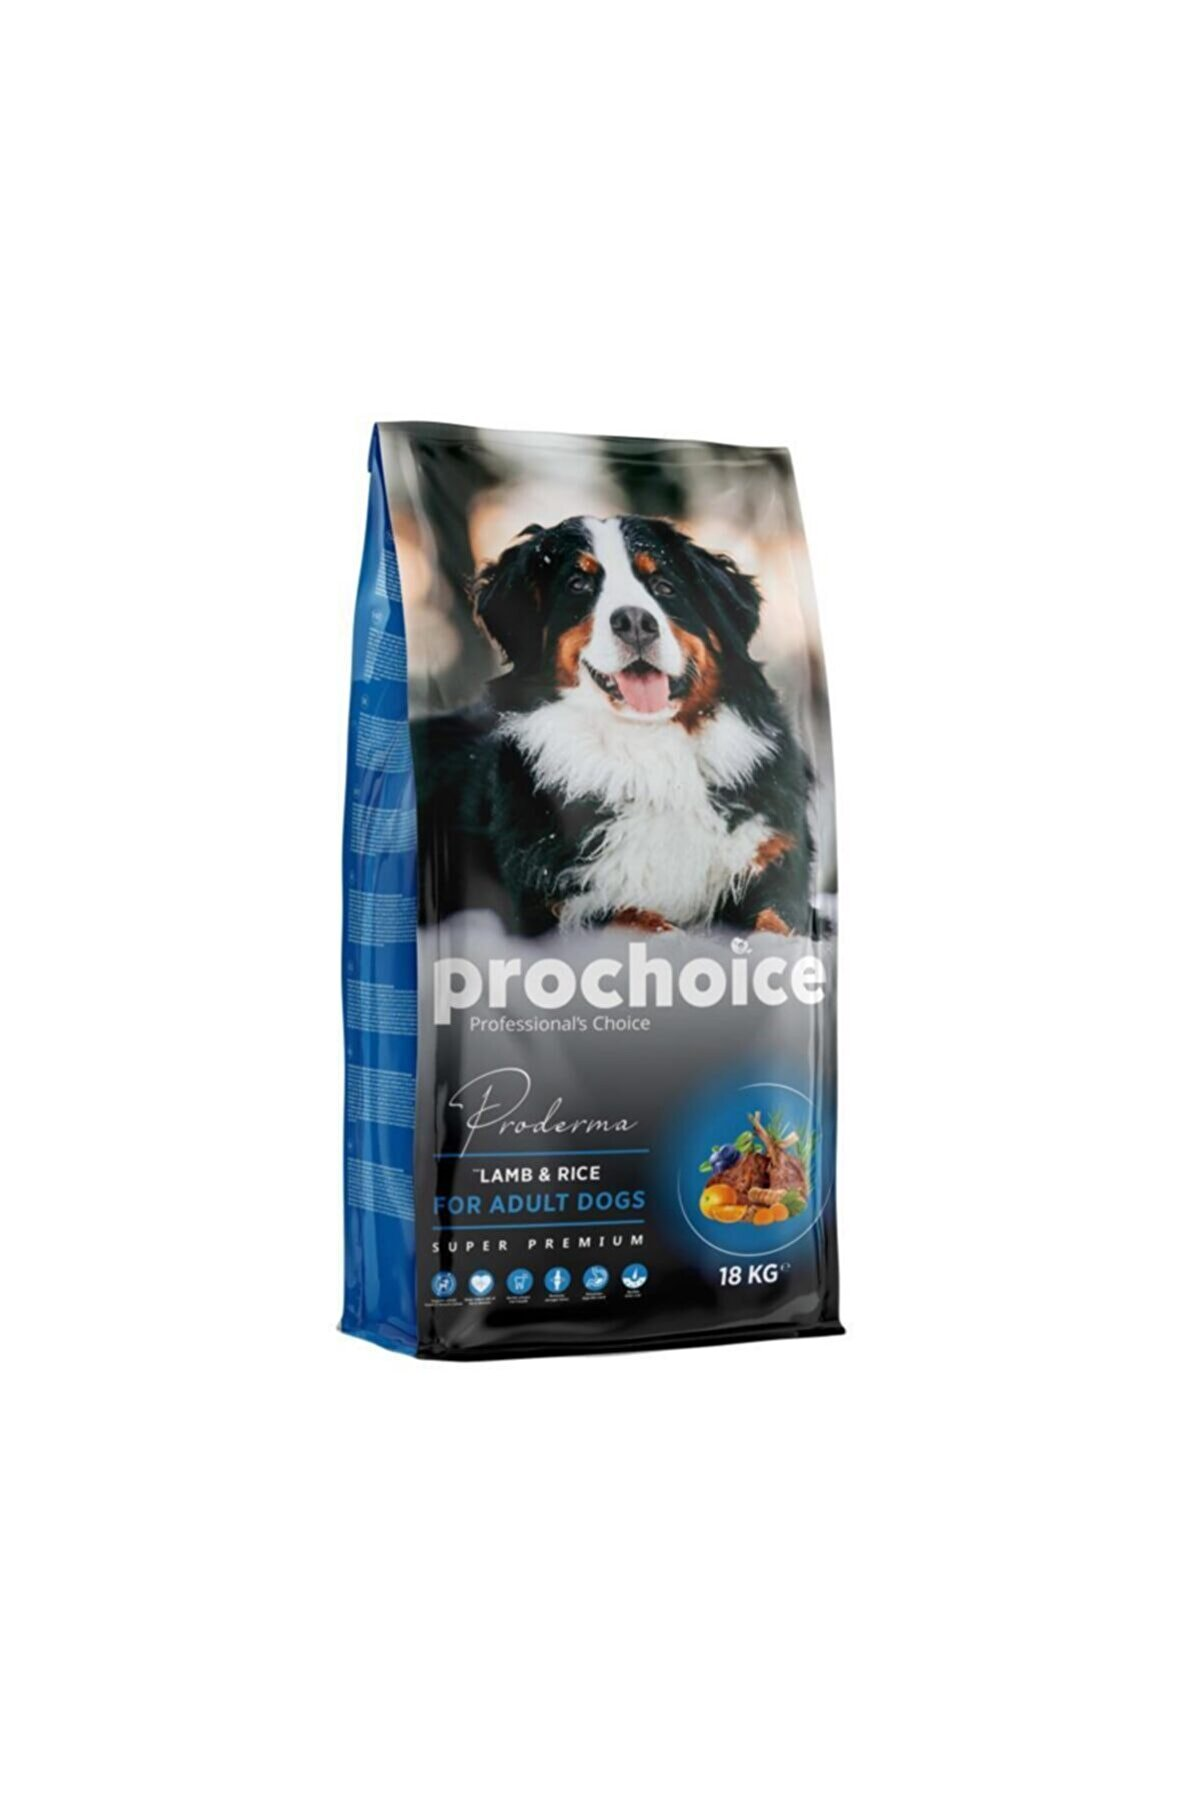 Pro Choice Proderma Kuzu Eti ve Pirinçli Köpek Maması 18 kg